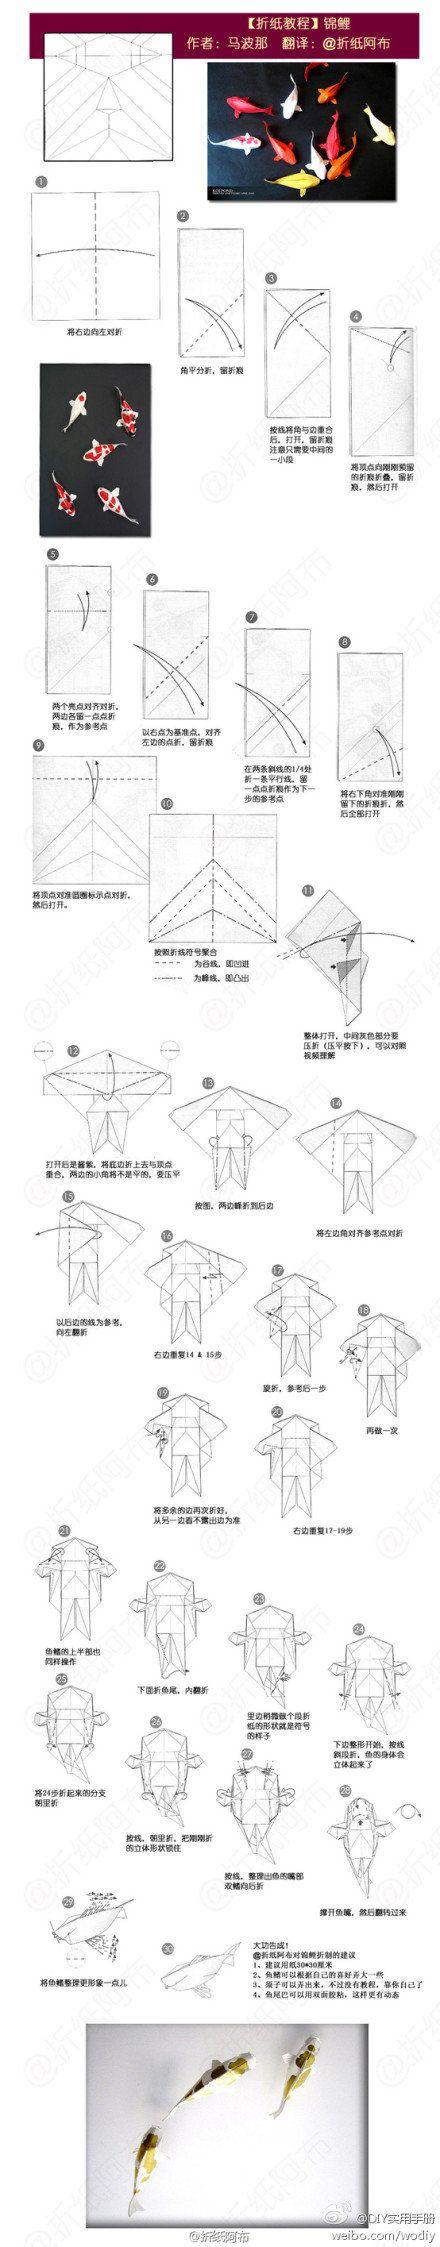 medium resolution of origami beautiful koi fish folding instructions origami instruction